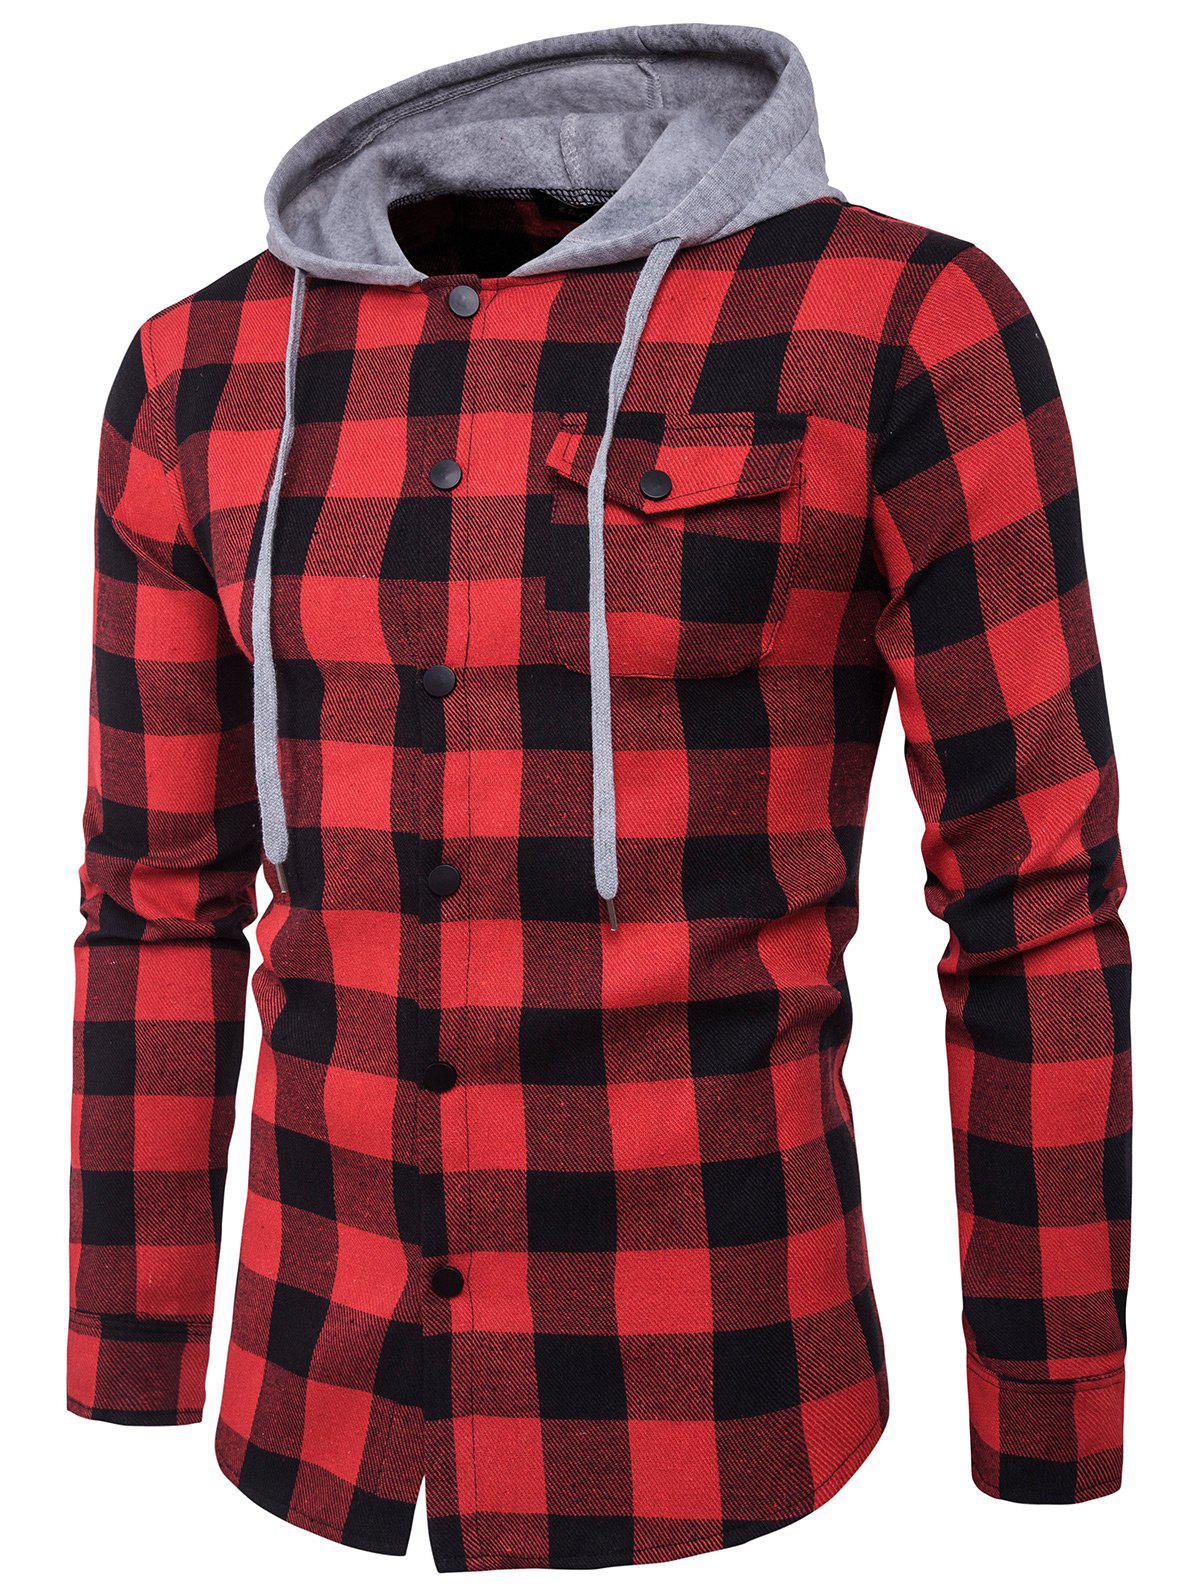 Image of Hooded Panel Pocket Tartan Shirt